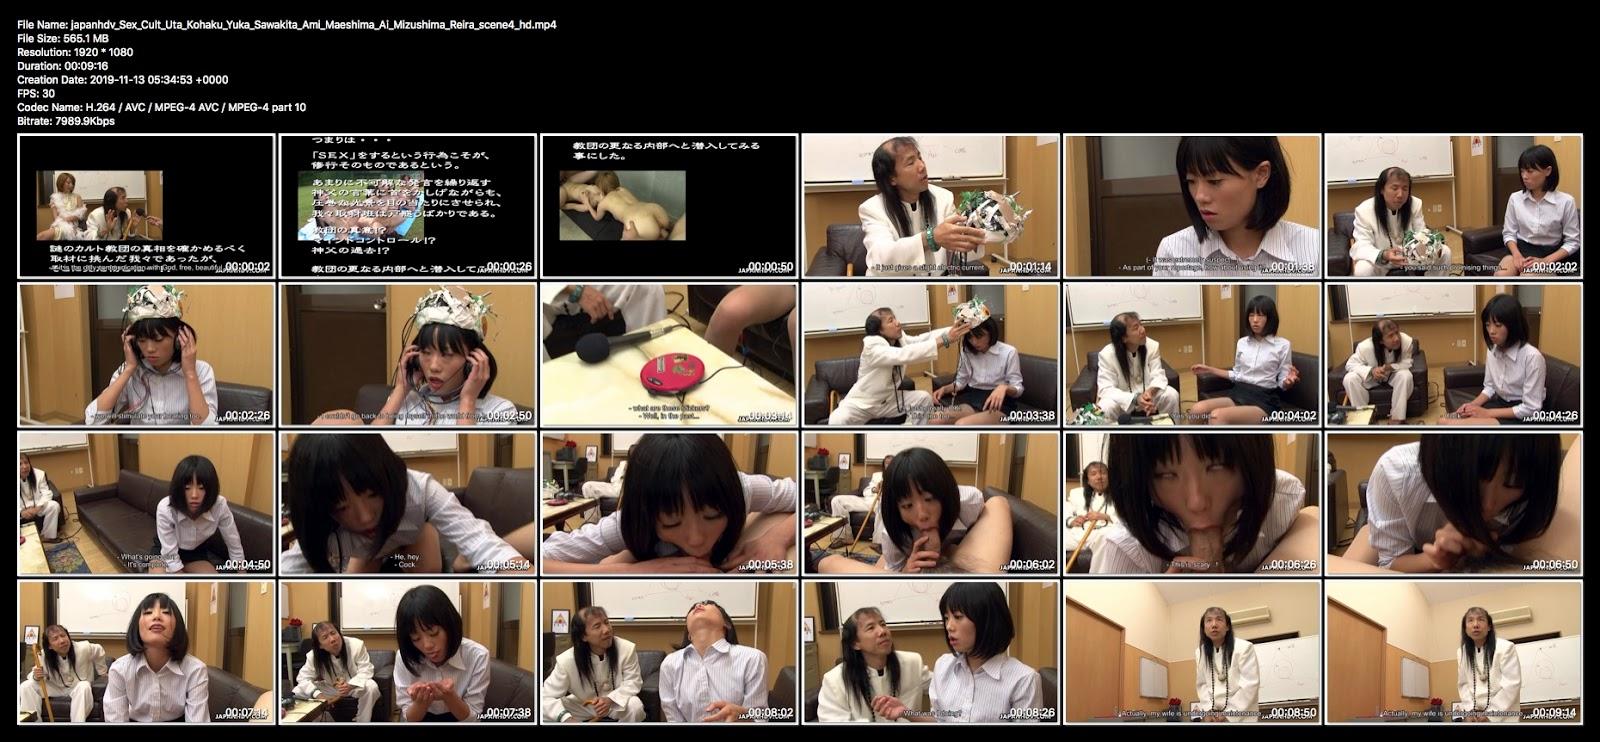 japanhdv Sex_Cult_Uta_Kohaku_Yuka_Sawakita_Ami_Maeshima_Ai_Mizushima_Reira_scene4_hd - idols